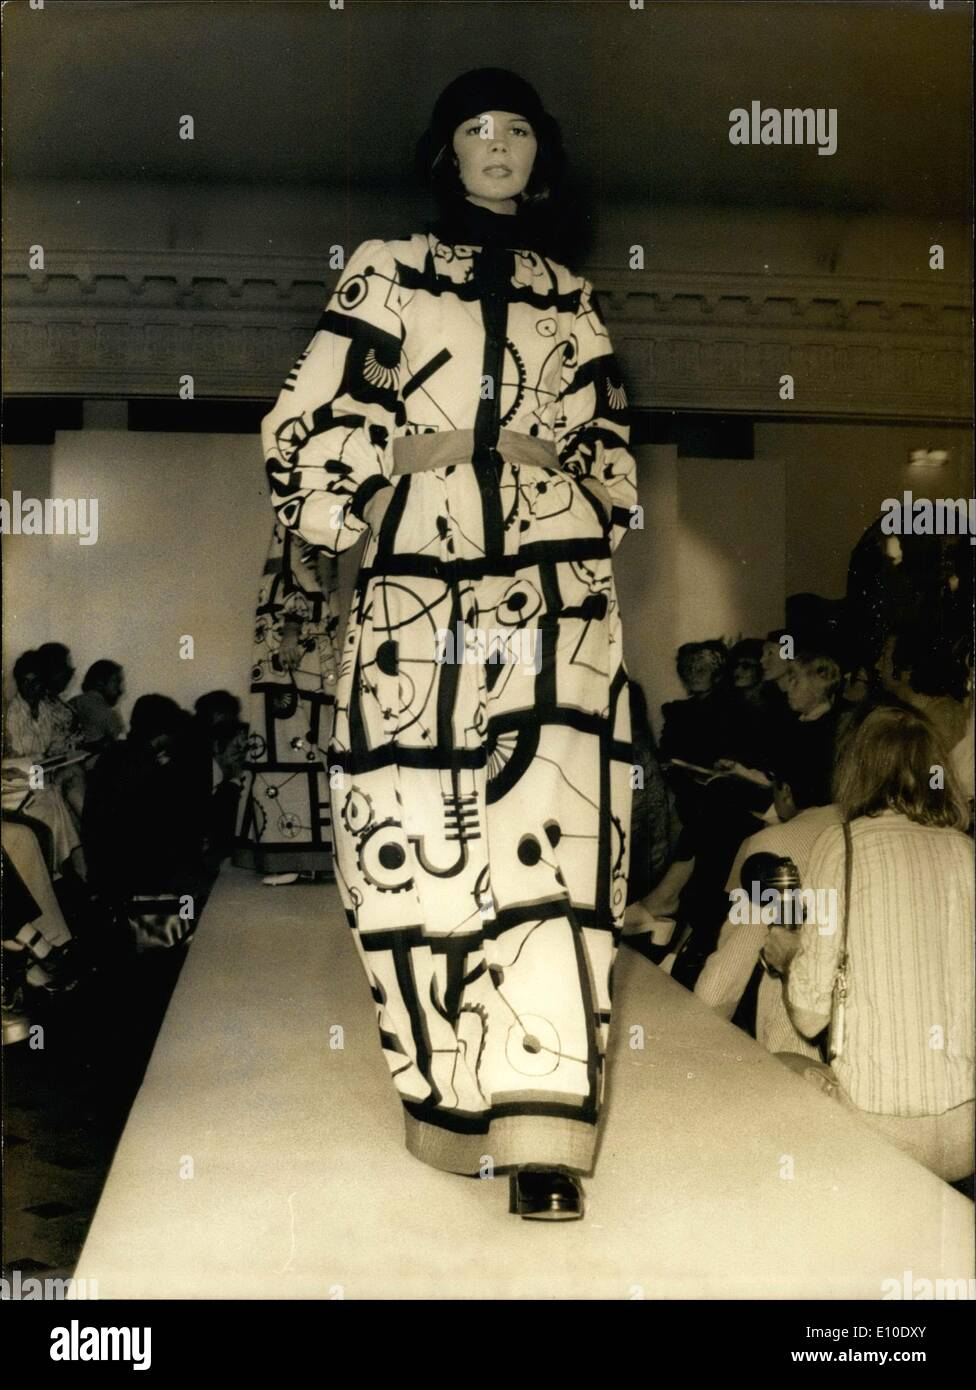 Jul. 24, 1972 - Model Walks Runway in Louis Feraud Black & White Print Dress - Stock Image